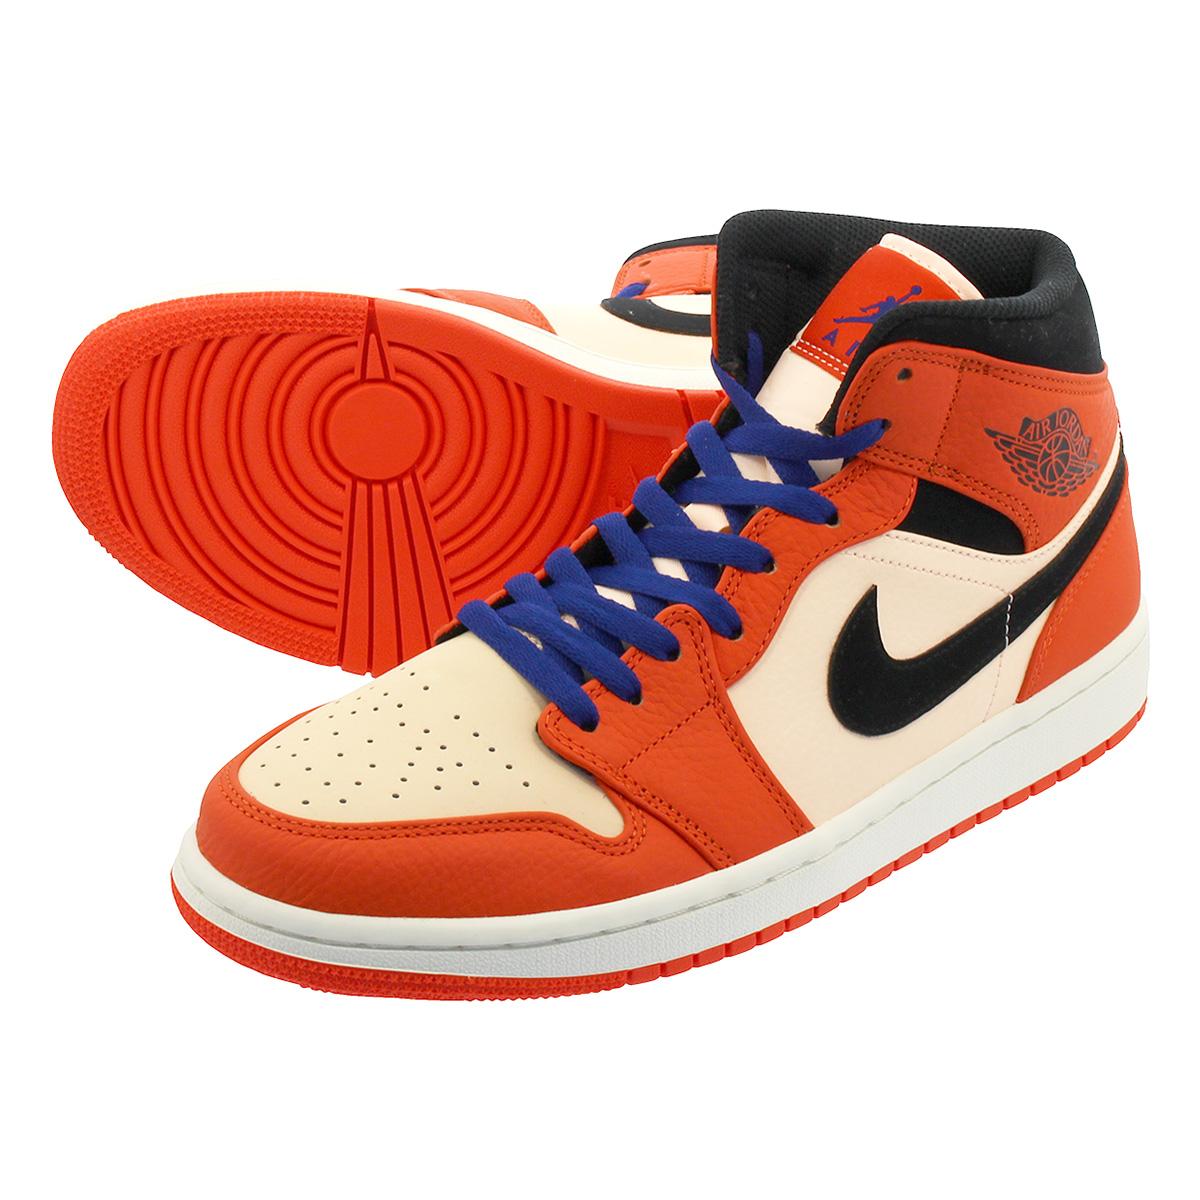 Authentic Cheap Mens Air Jordan Retro 13 Low Orangeblack For Sale ... 51bf181d7